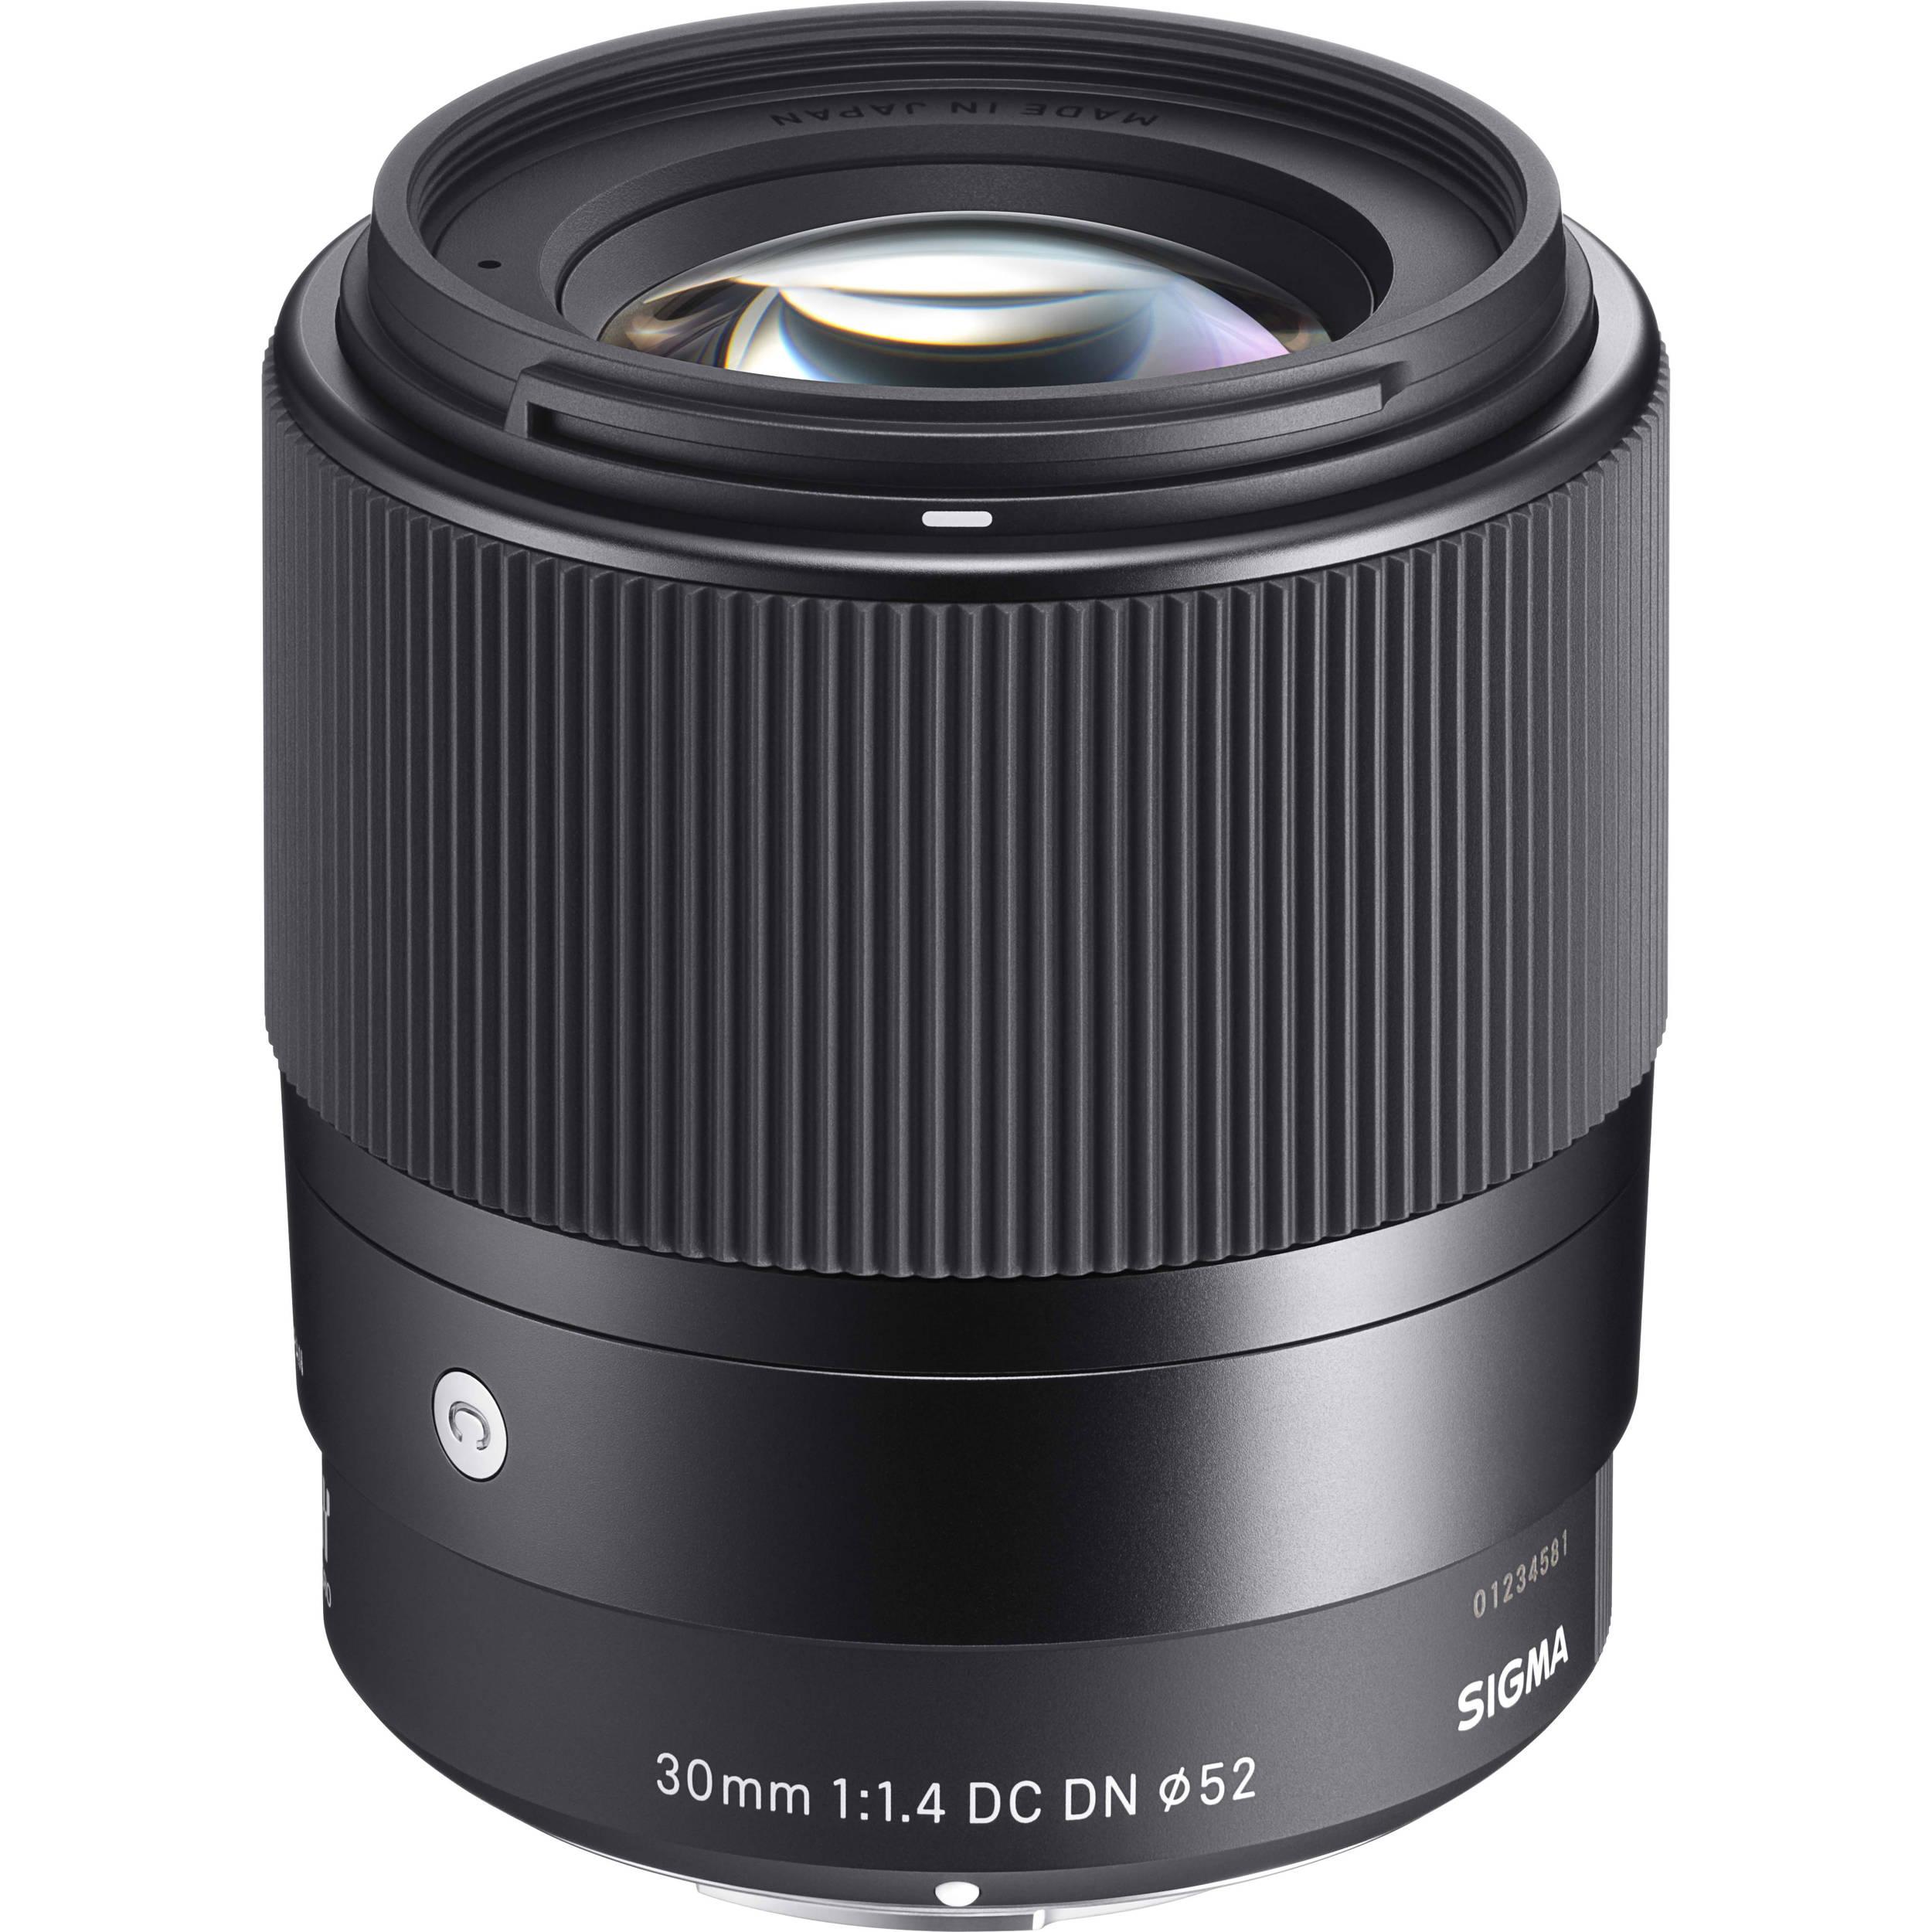 39160c4f12 Sigma 30mm f/1.4 DC DN Contemporary Lens for Sony E 302965 B&H